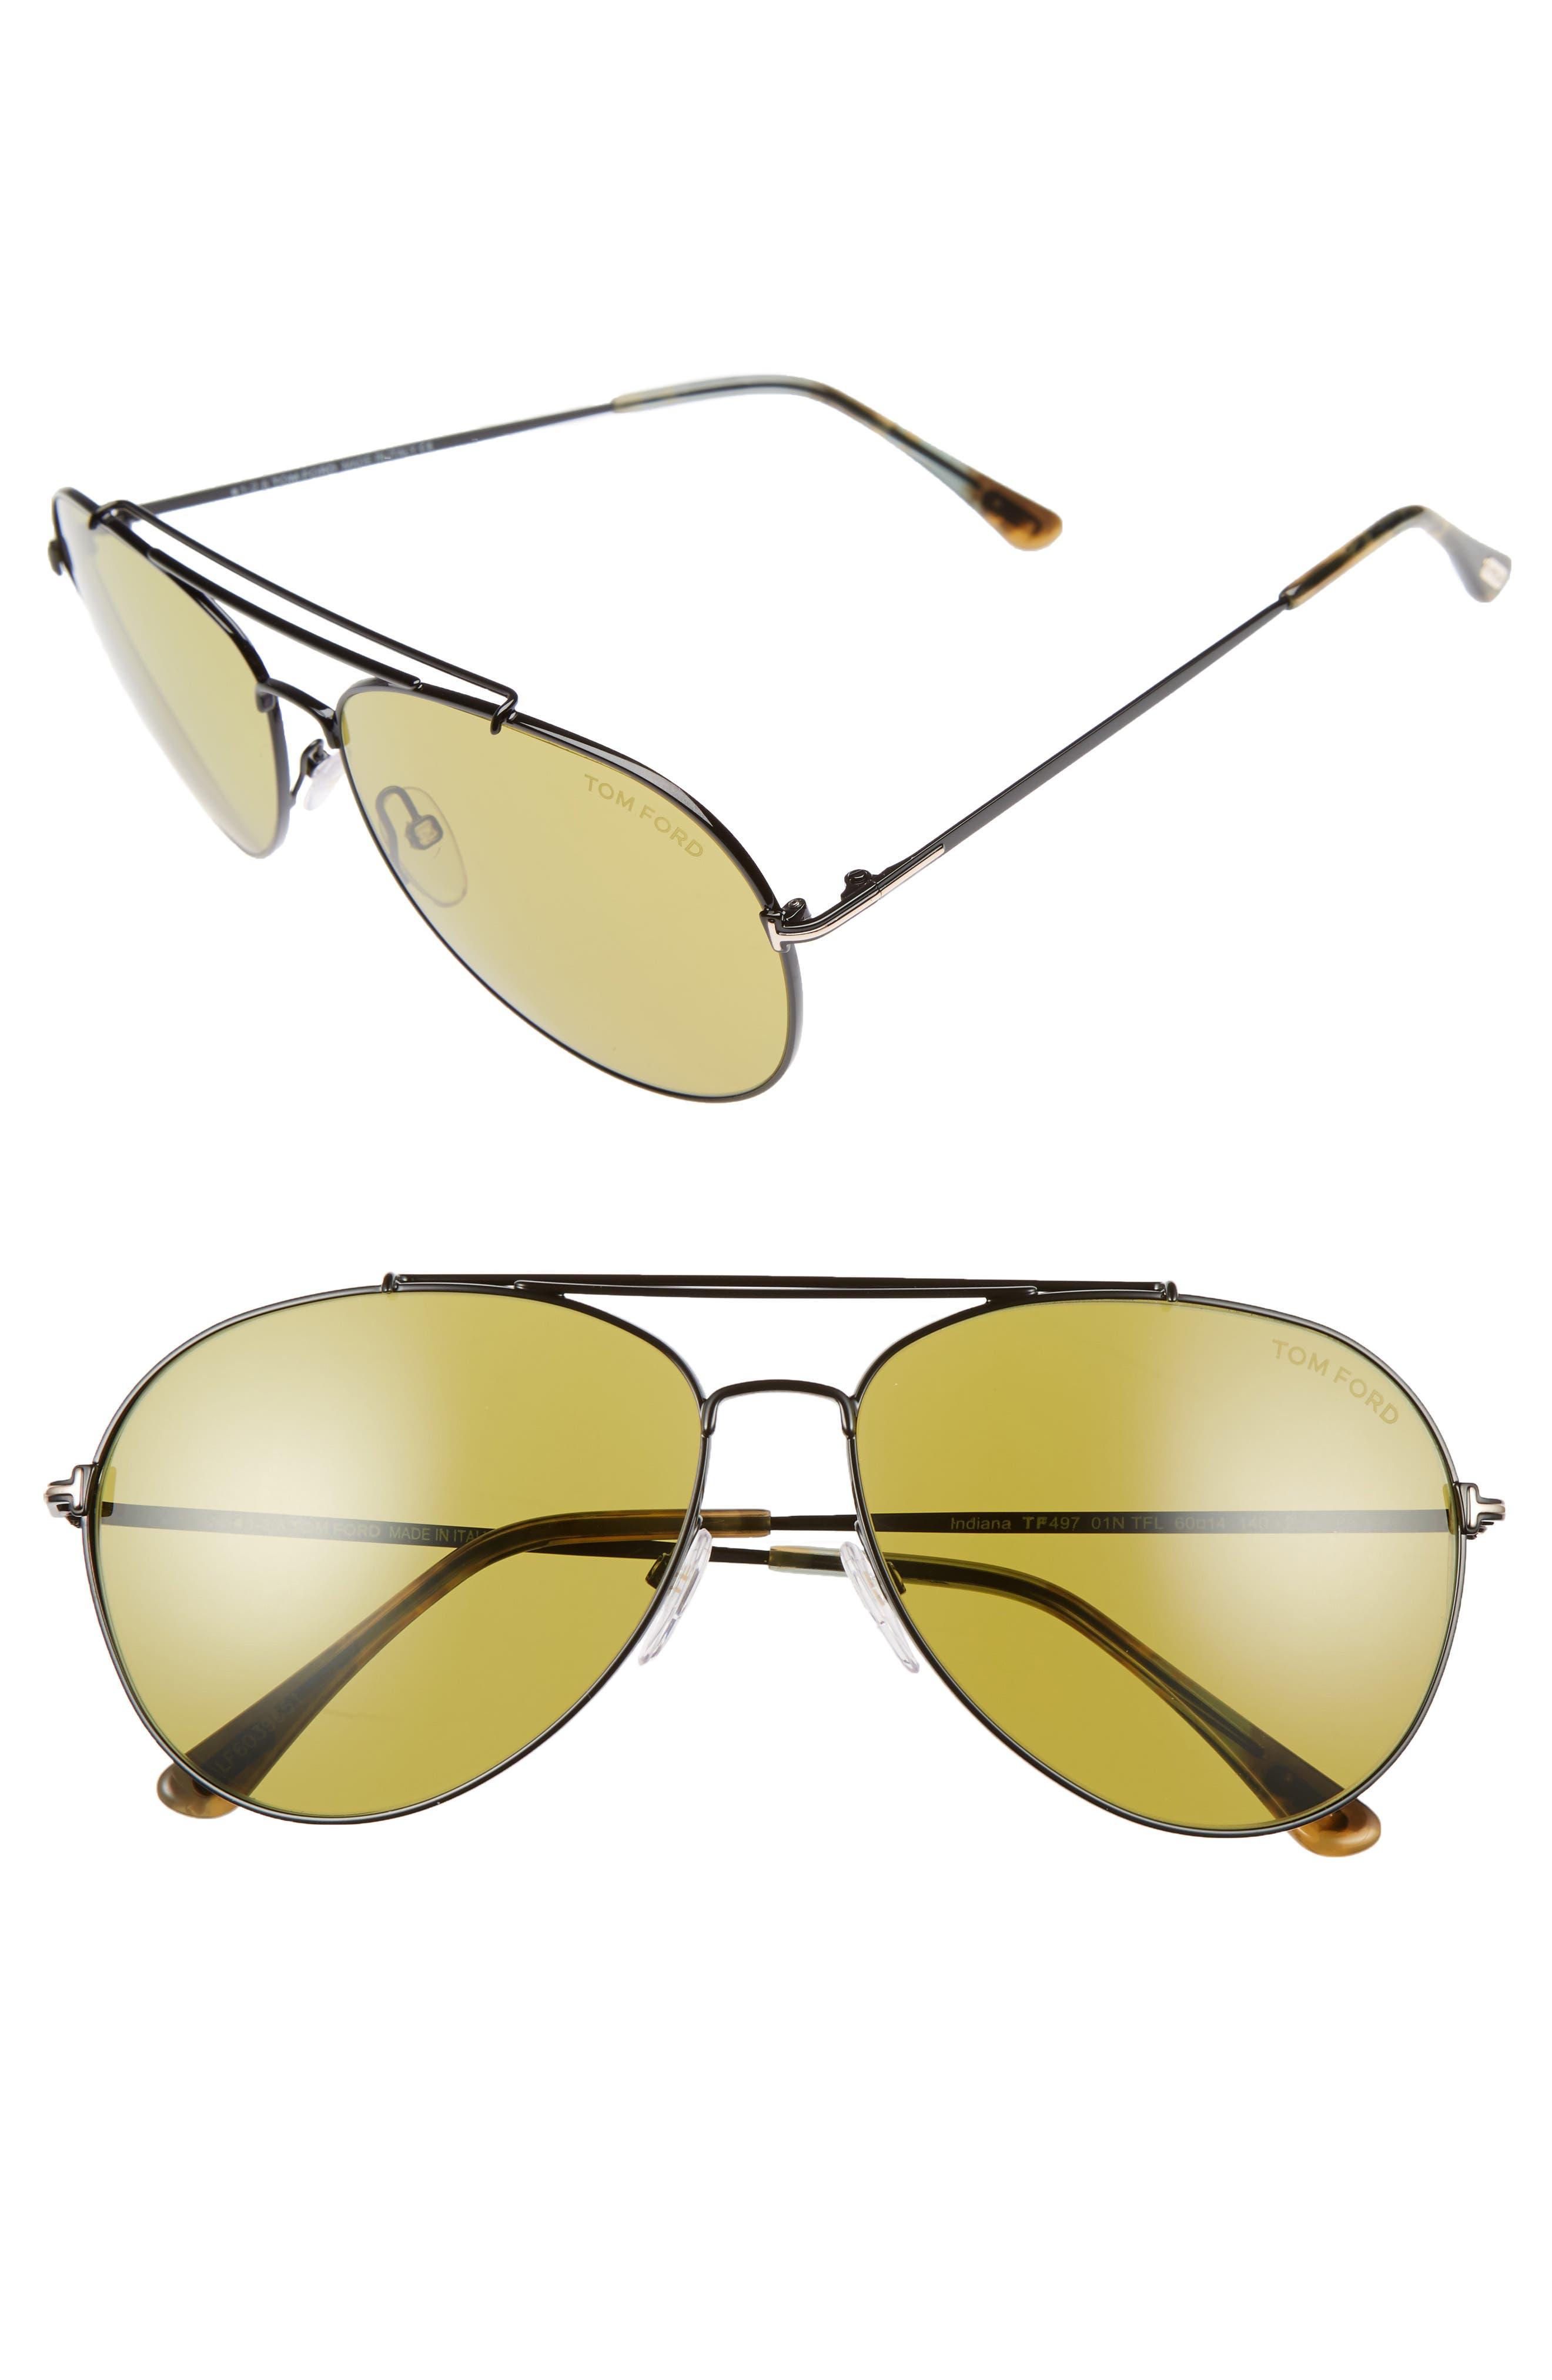 Indiana 58mm Barberini Lens Aviator Sunglasses,                             Main thumbnail 1, color,                             Green/ Green Havana/ Black